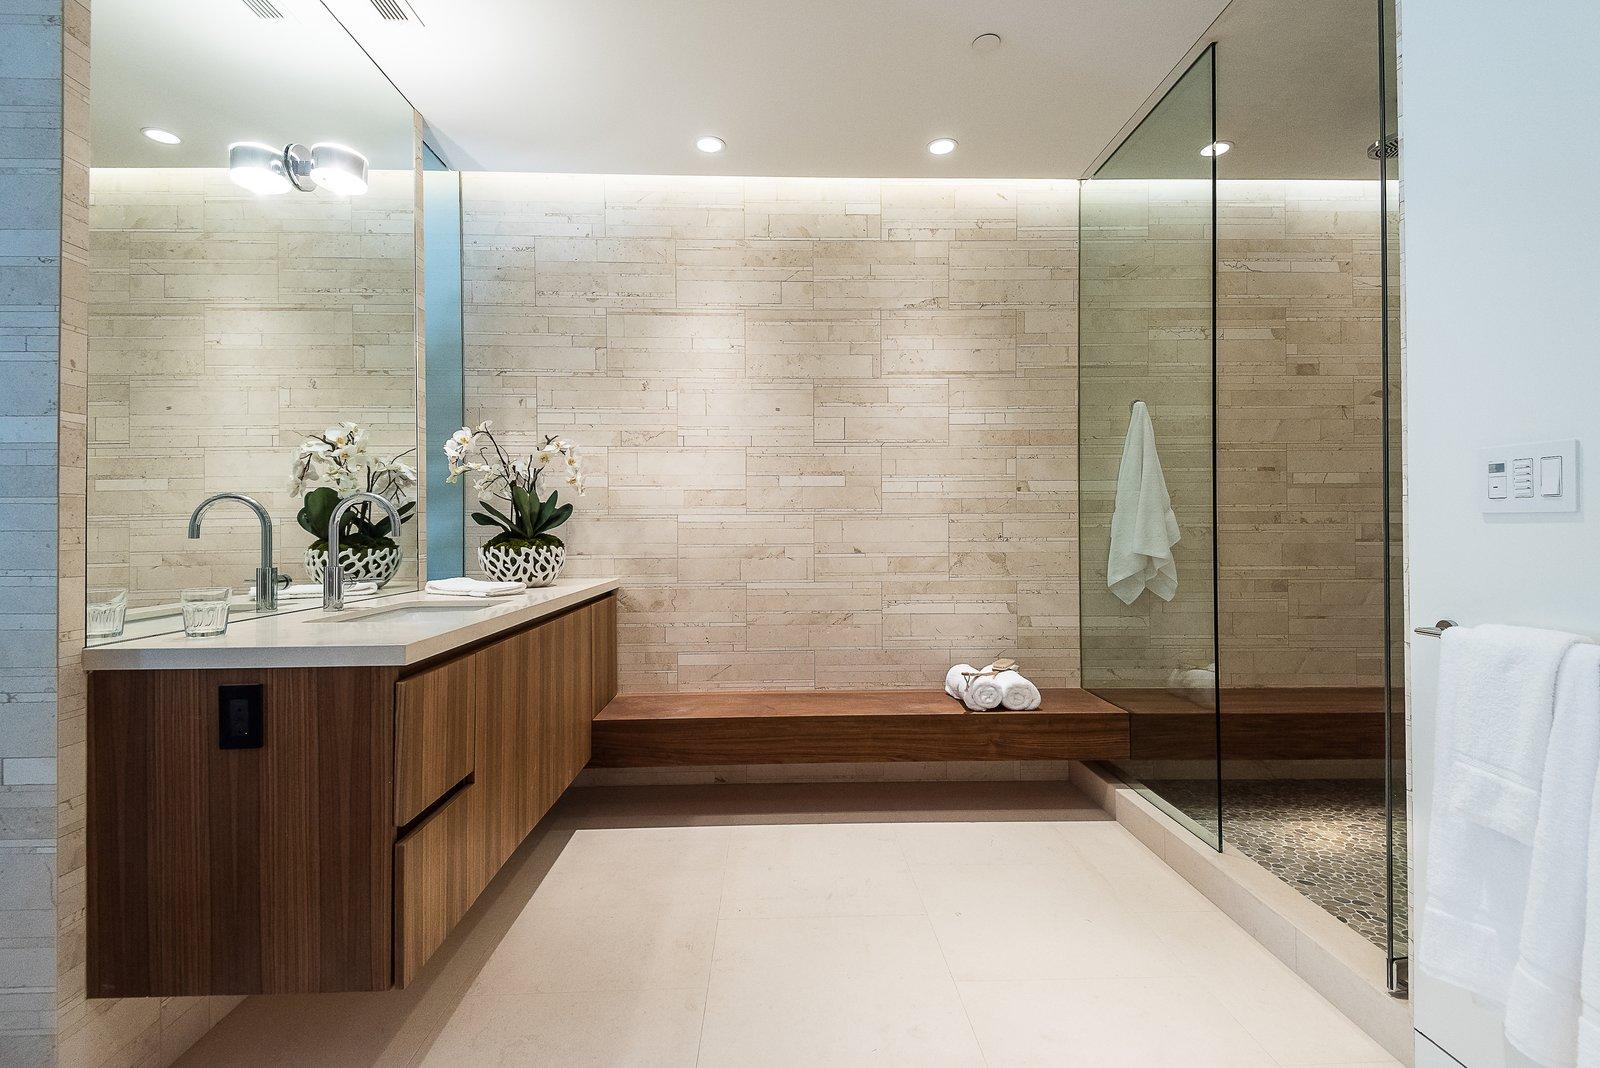 Gym Bath  Amalfi Drive Residence by Daryl Olesinski